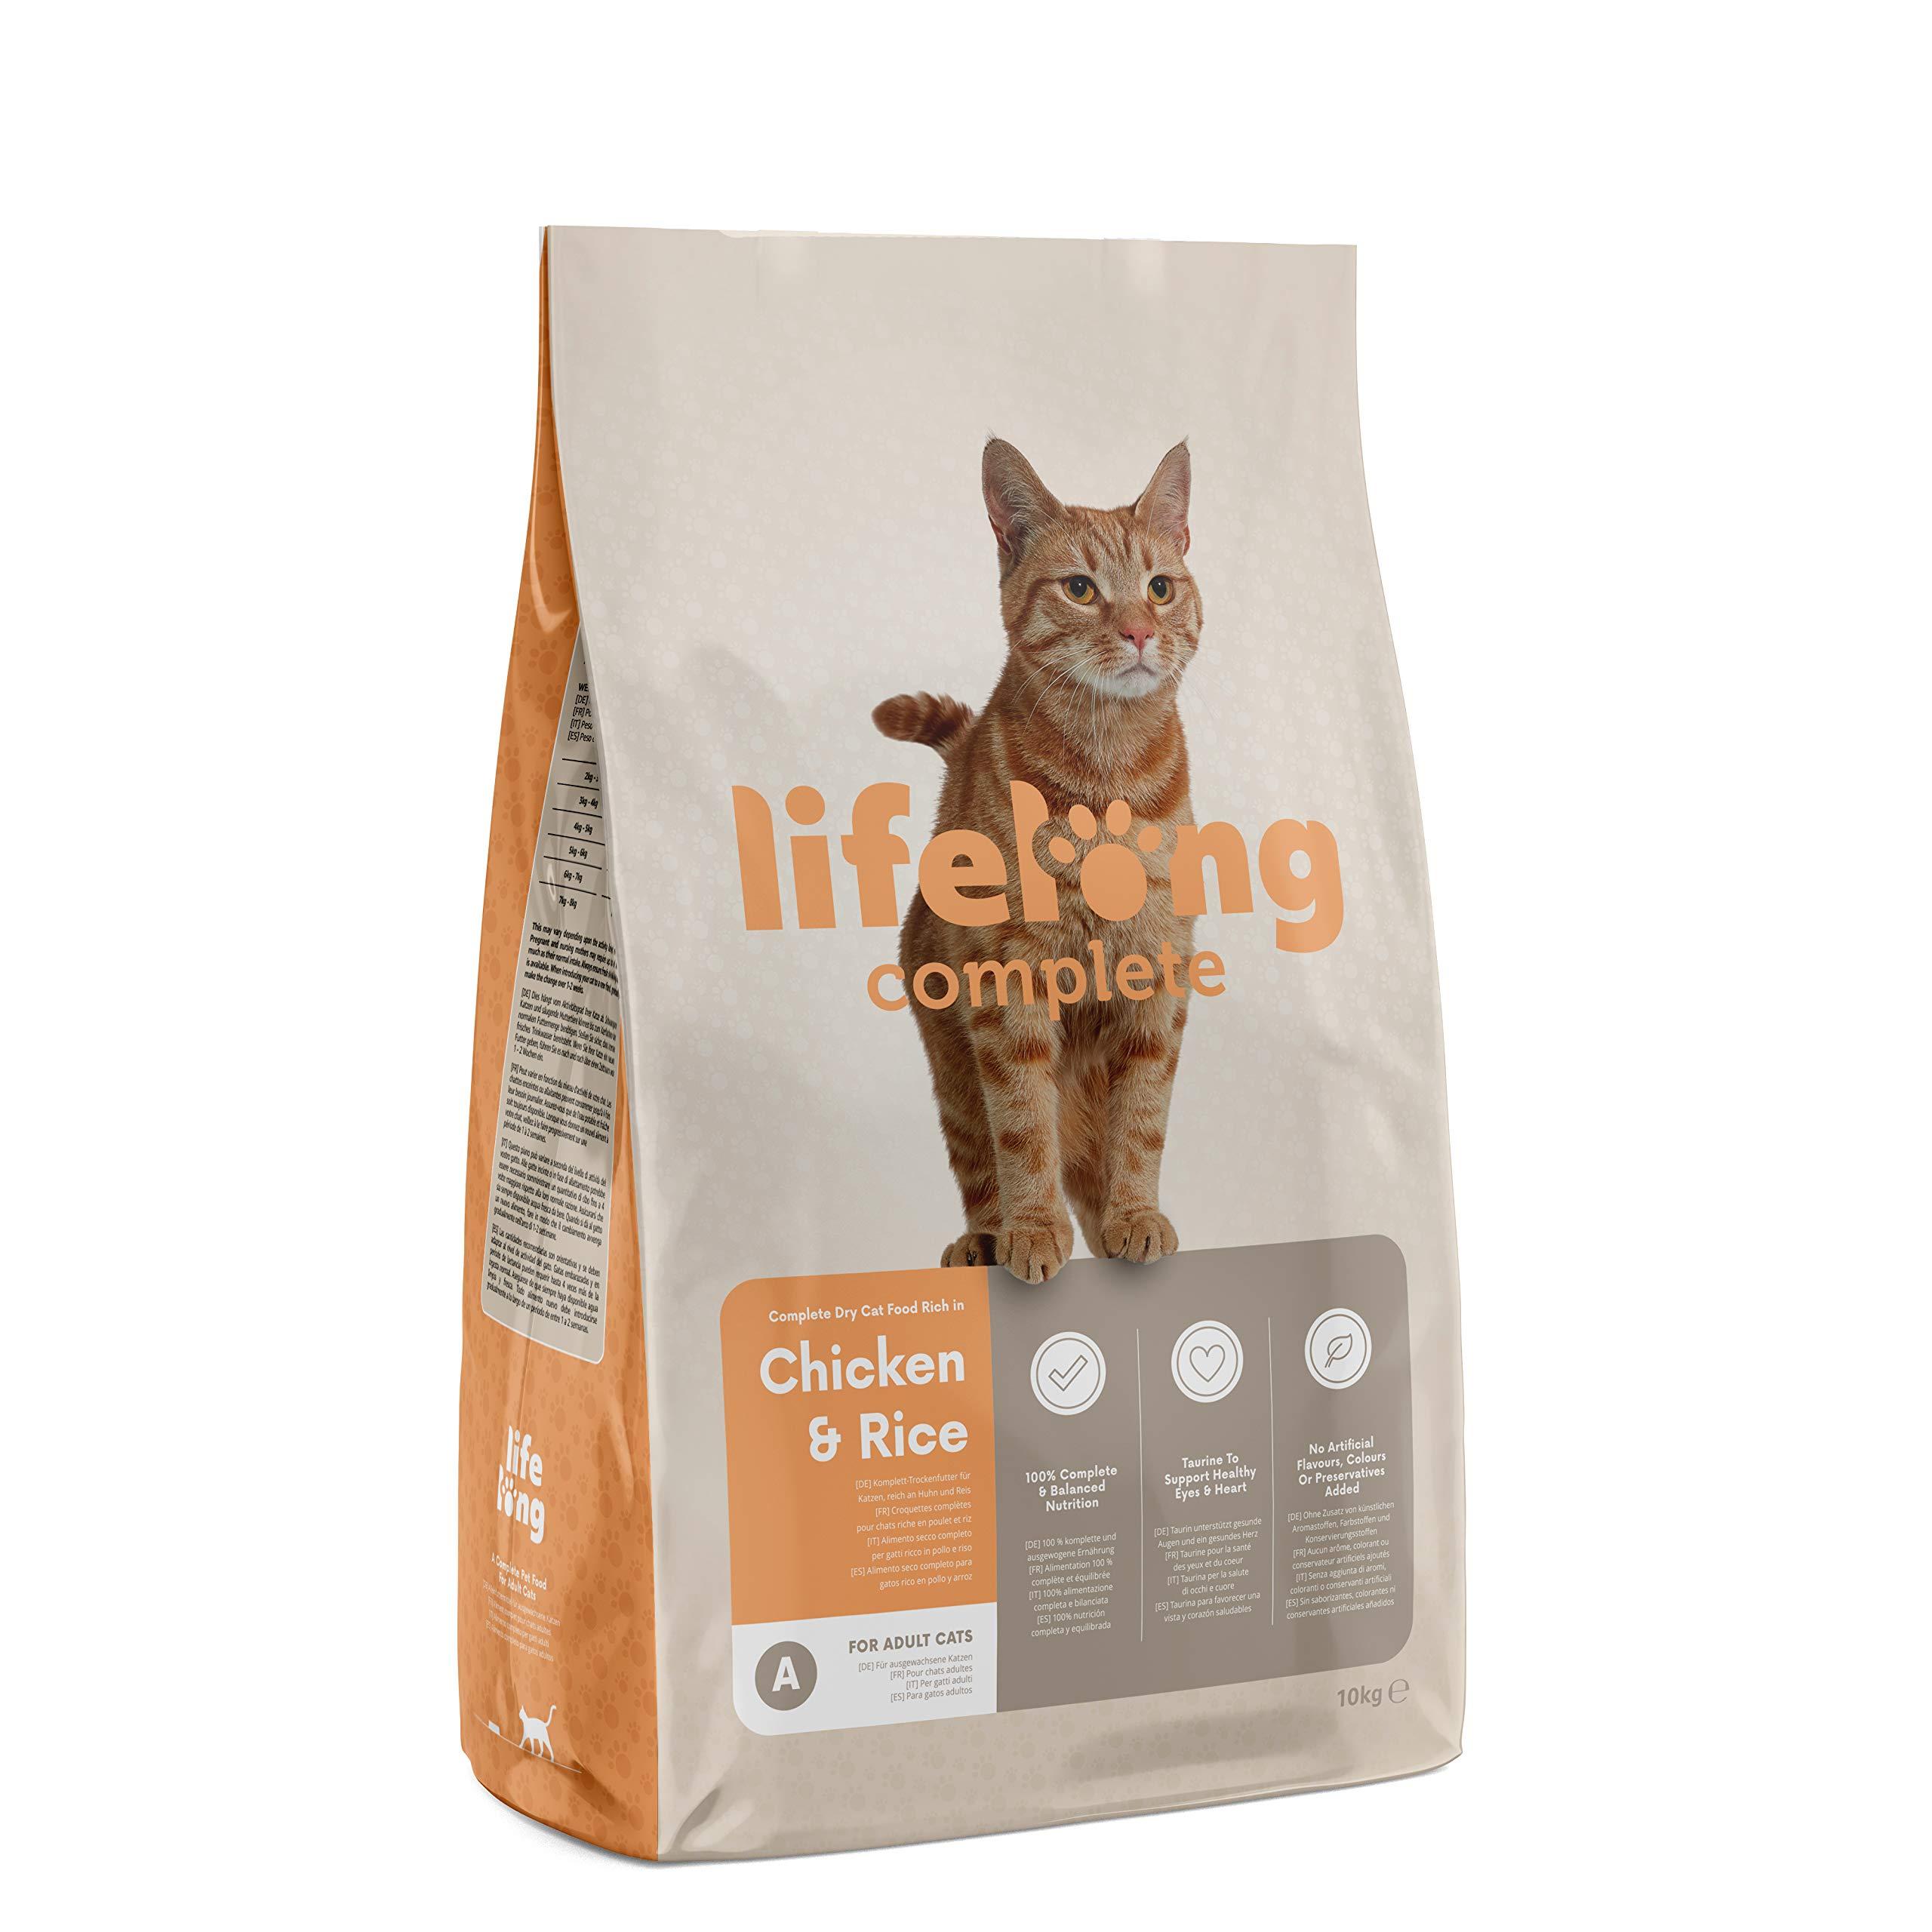 Marca Amazon – Lifelong Complete- Alimento seco completo para gatos adultos rico en pollo y arroz, 1 x 10 kg